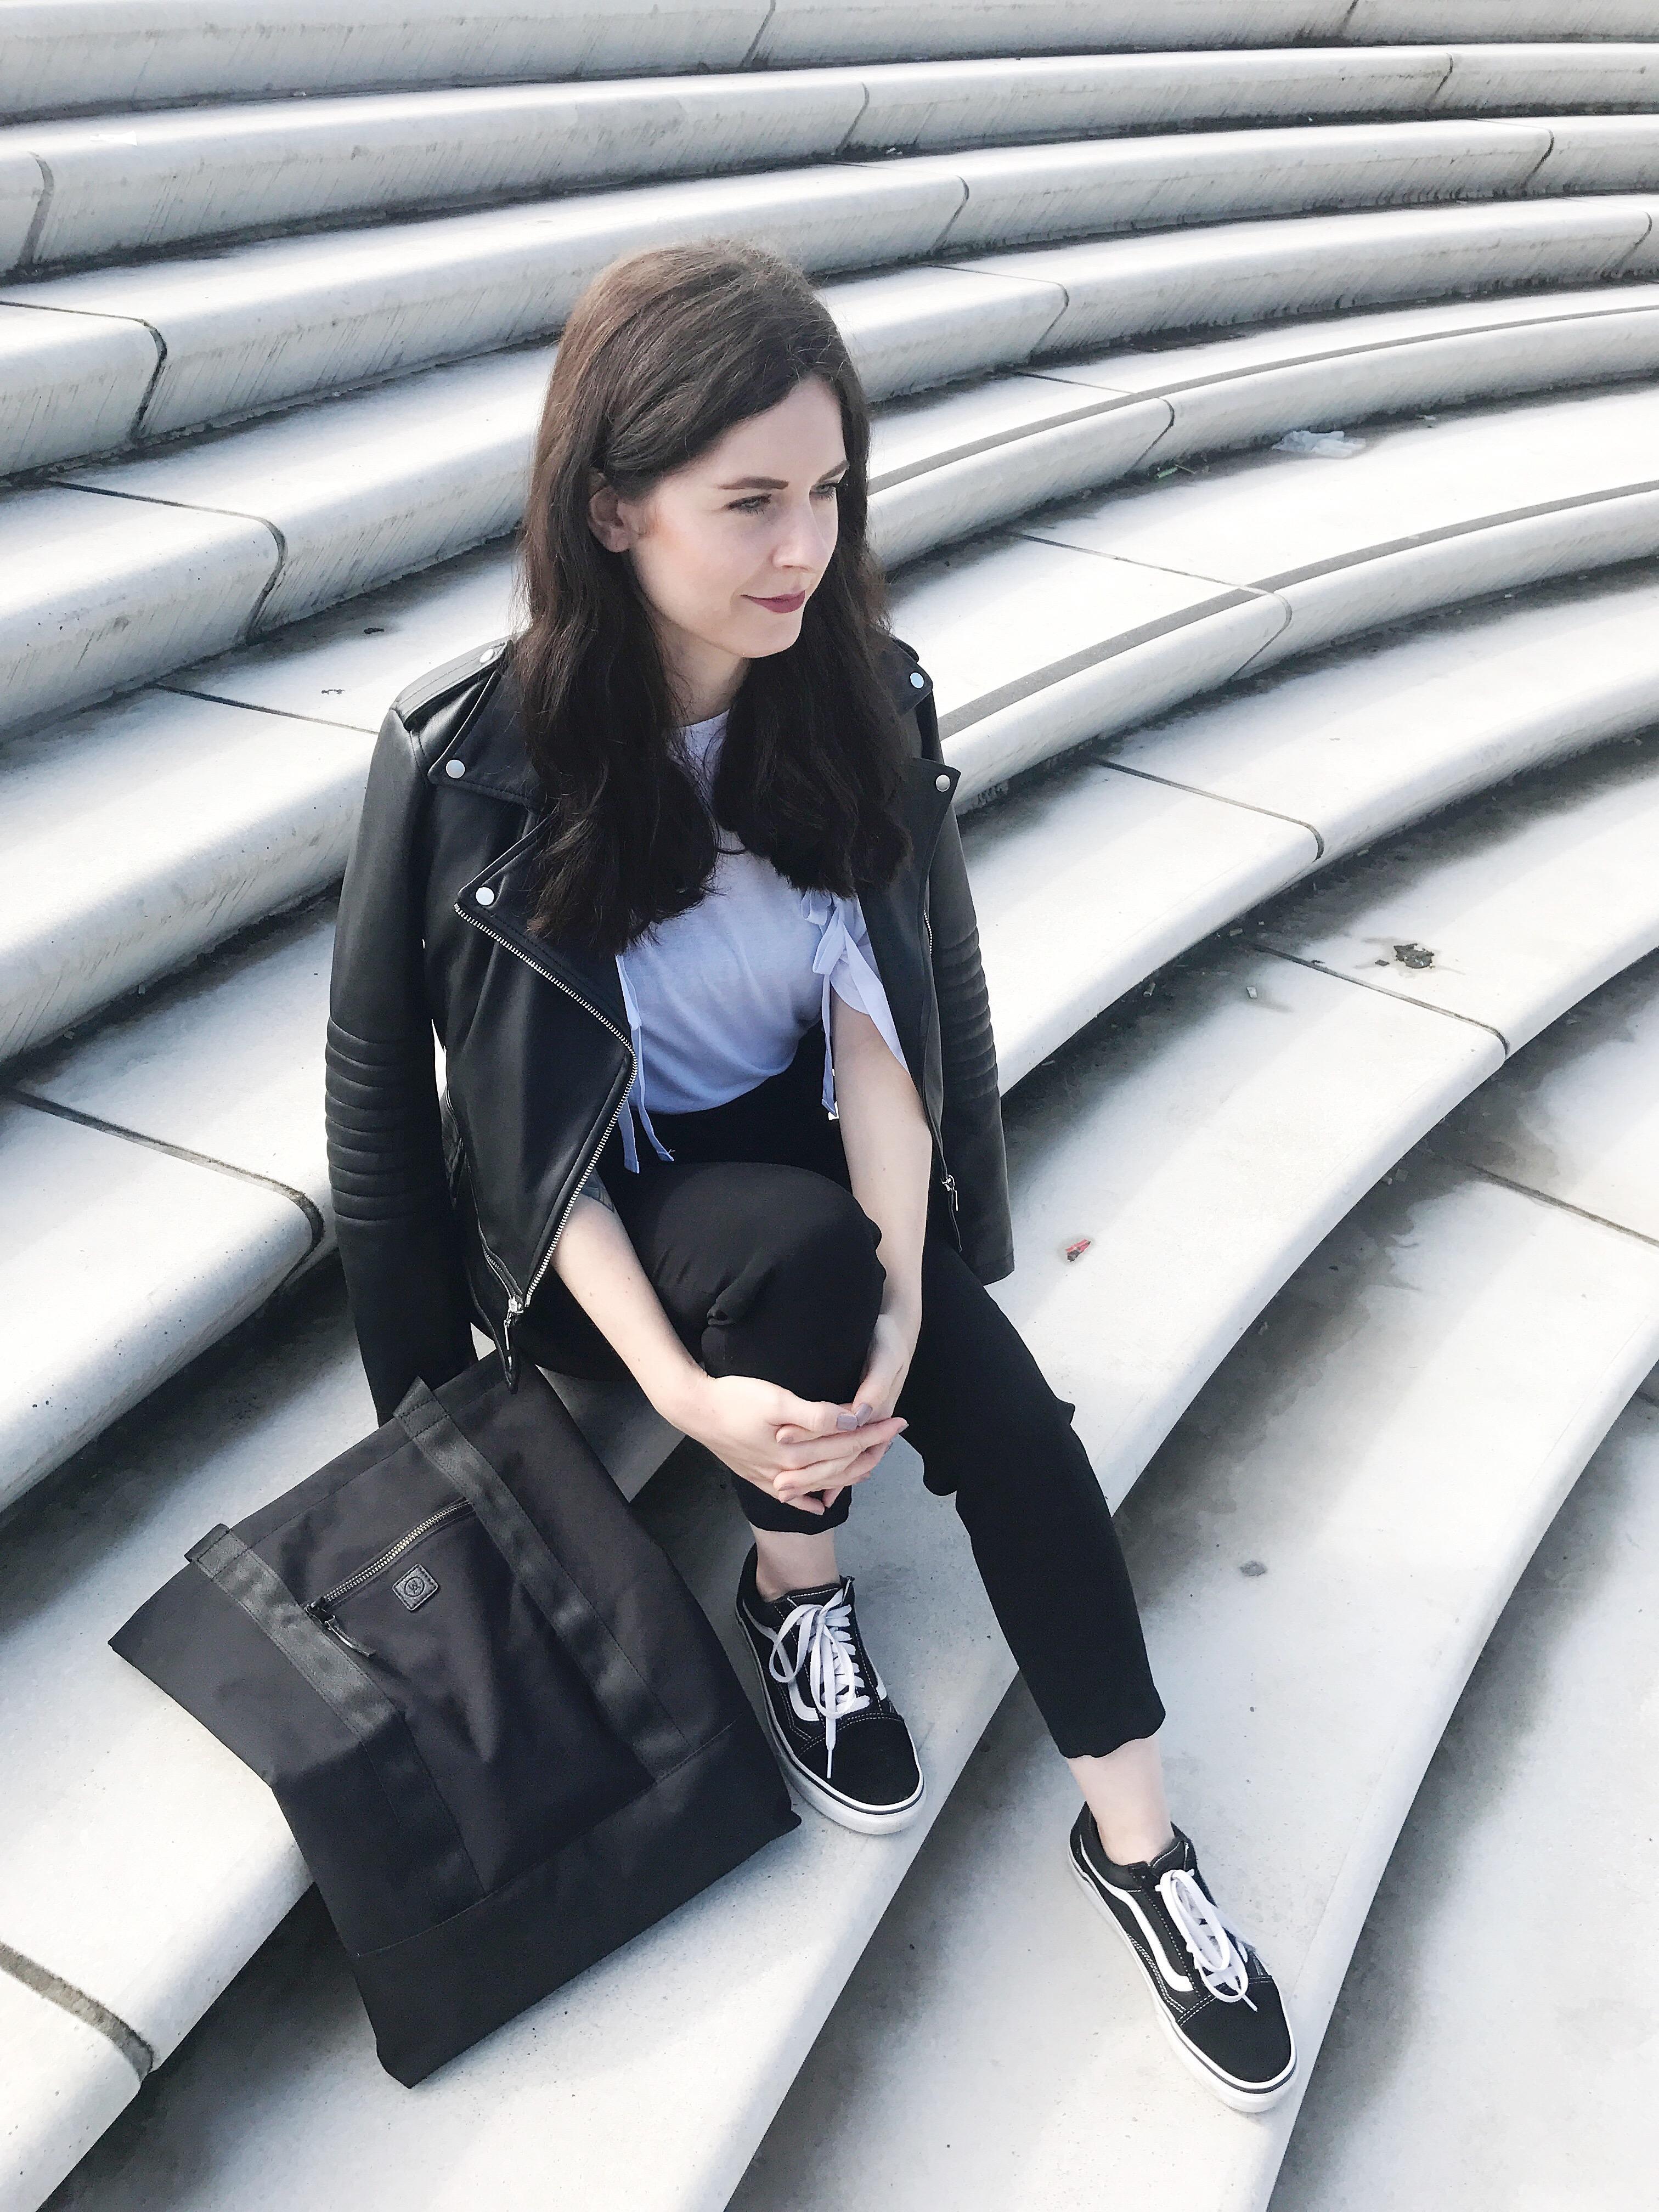 Weißes T Shirt, schwarze Hose, Lederjacke: Schneller